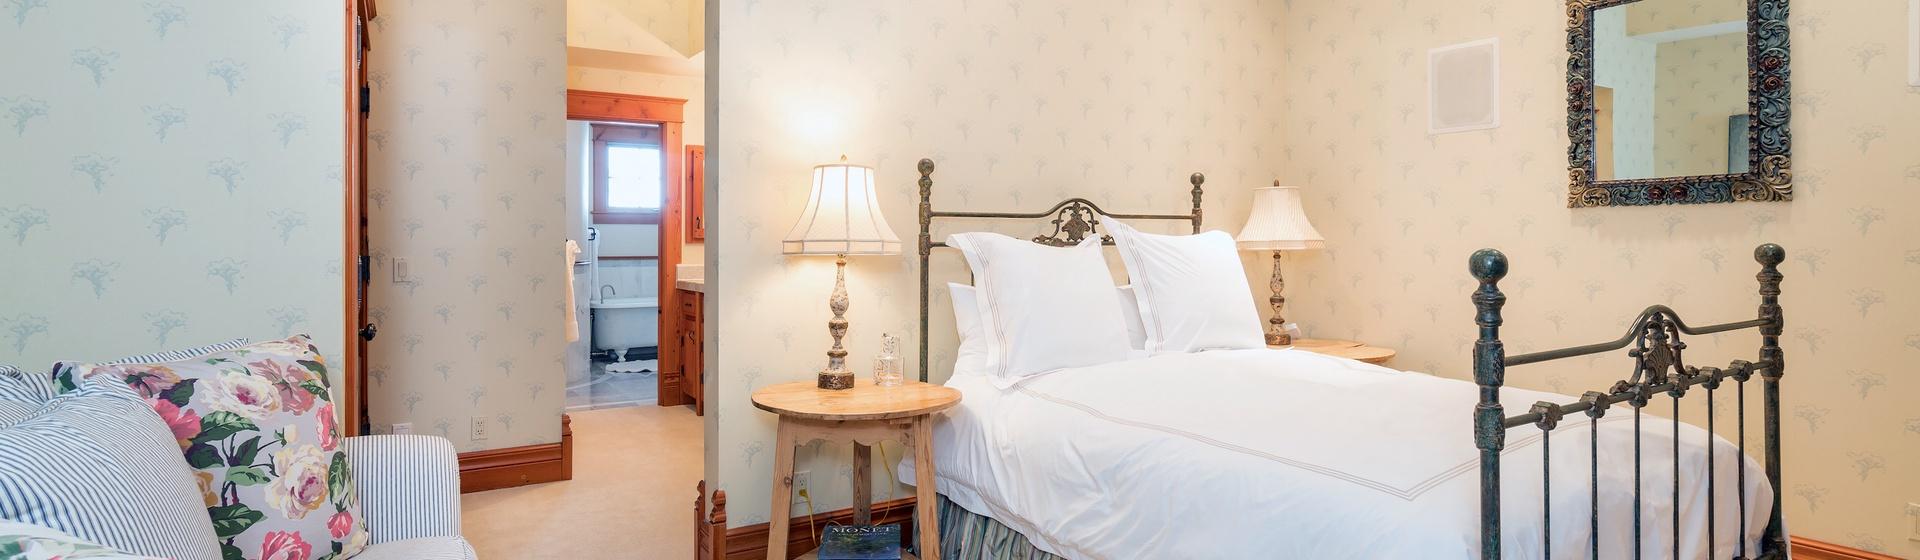 33-MountainVillage-Positive-Outlook-Queen-Guest-Bedroom-Web.jpg